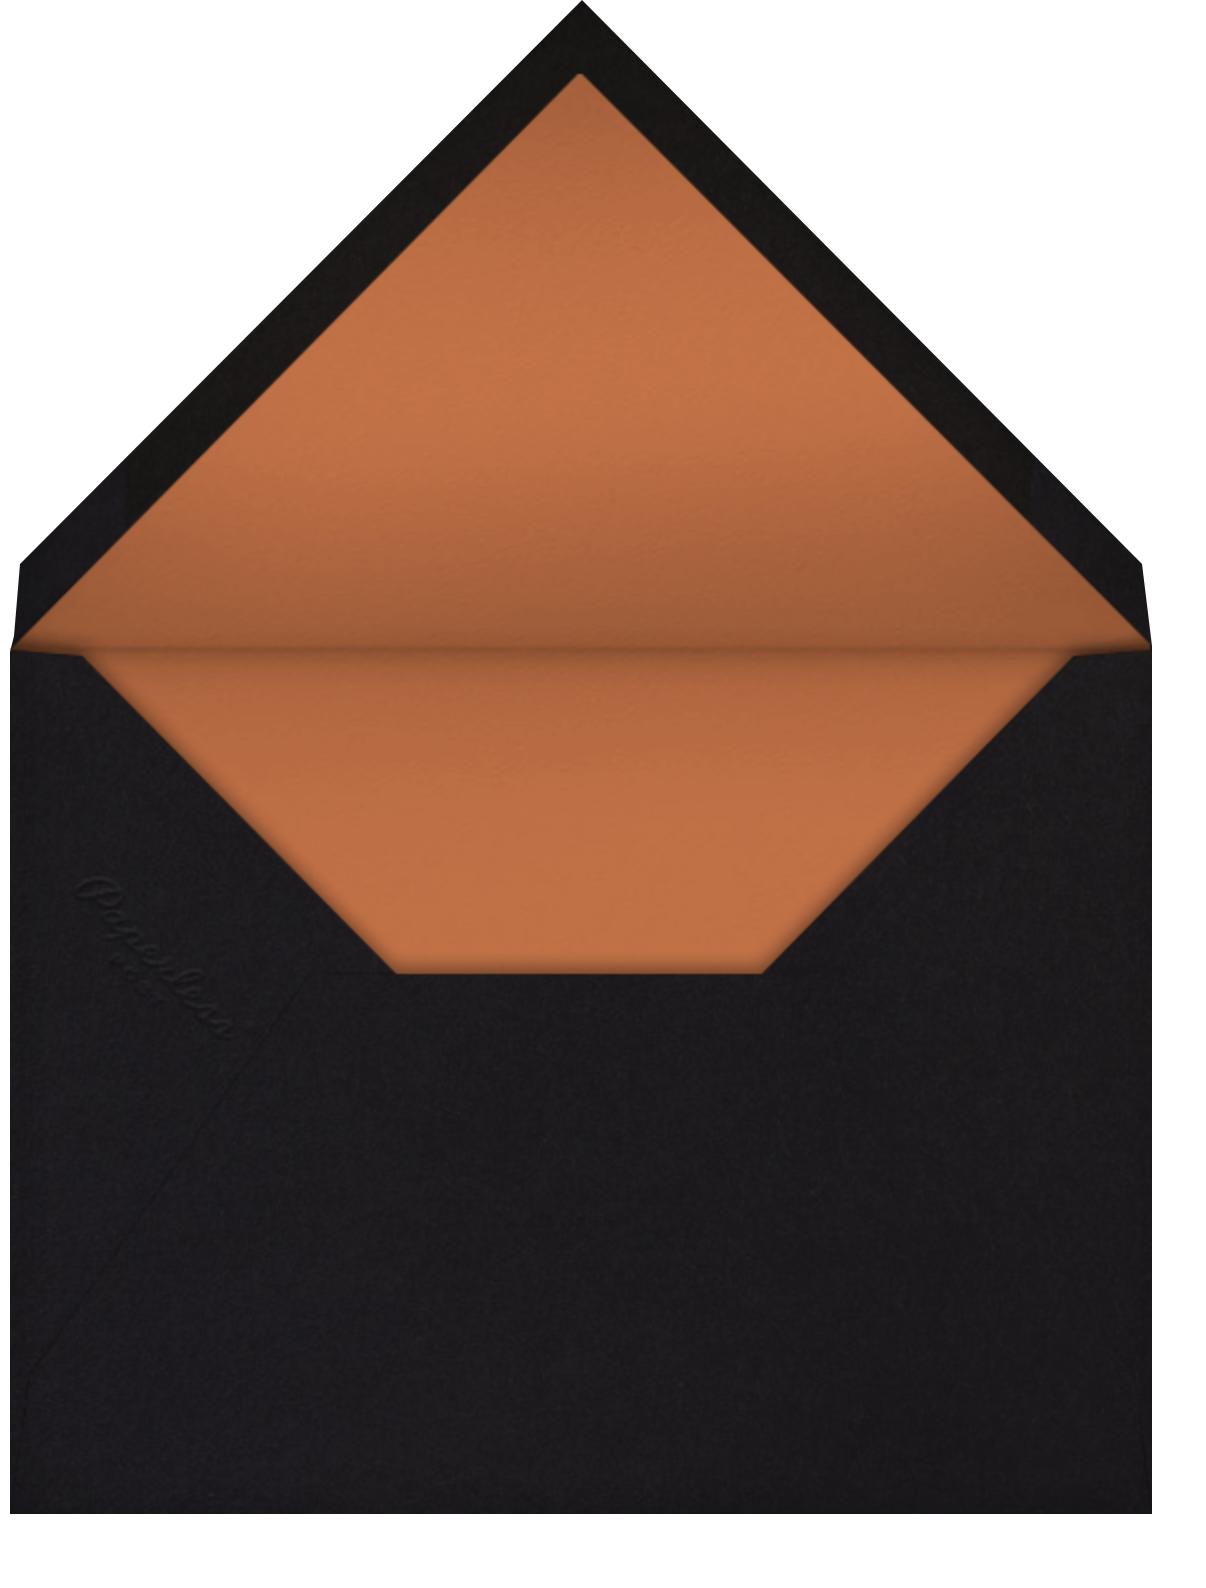 Deco Thanksgiving (Marsha Robinson) - Red Cap Cards - Thanksgiving - envelope back